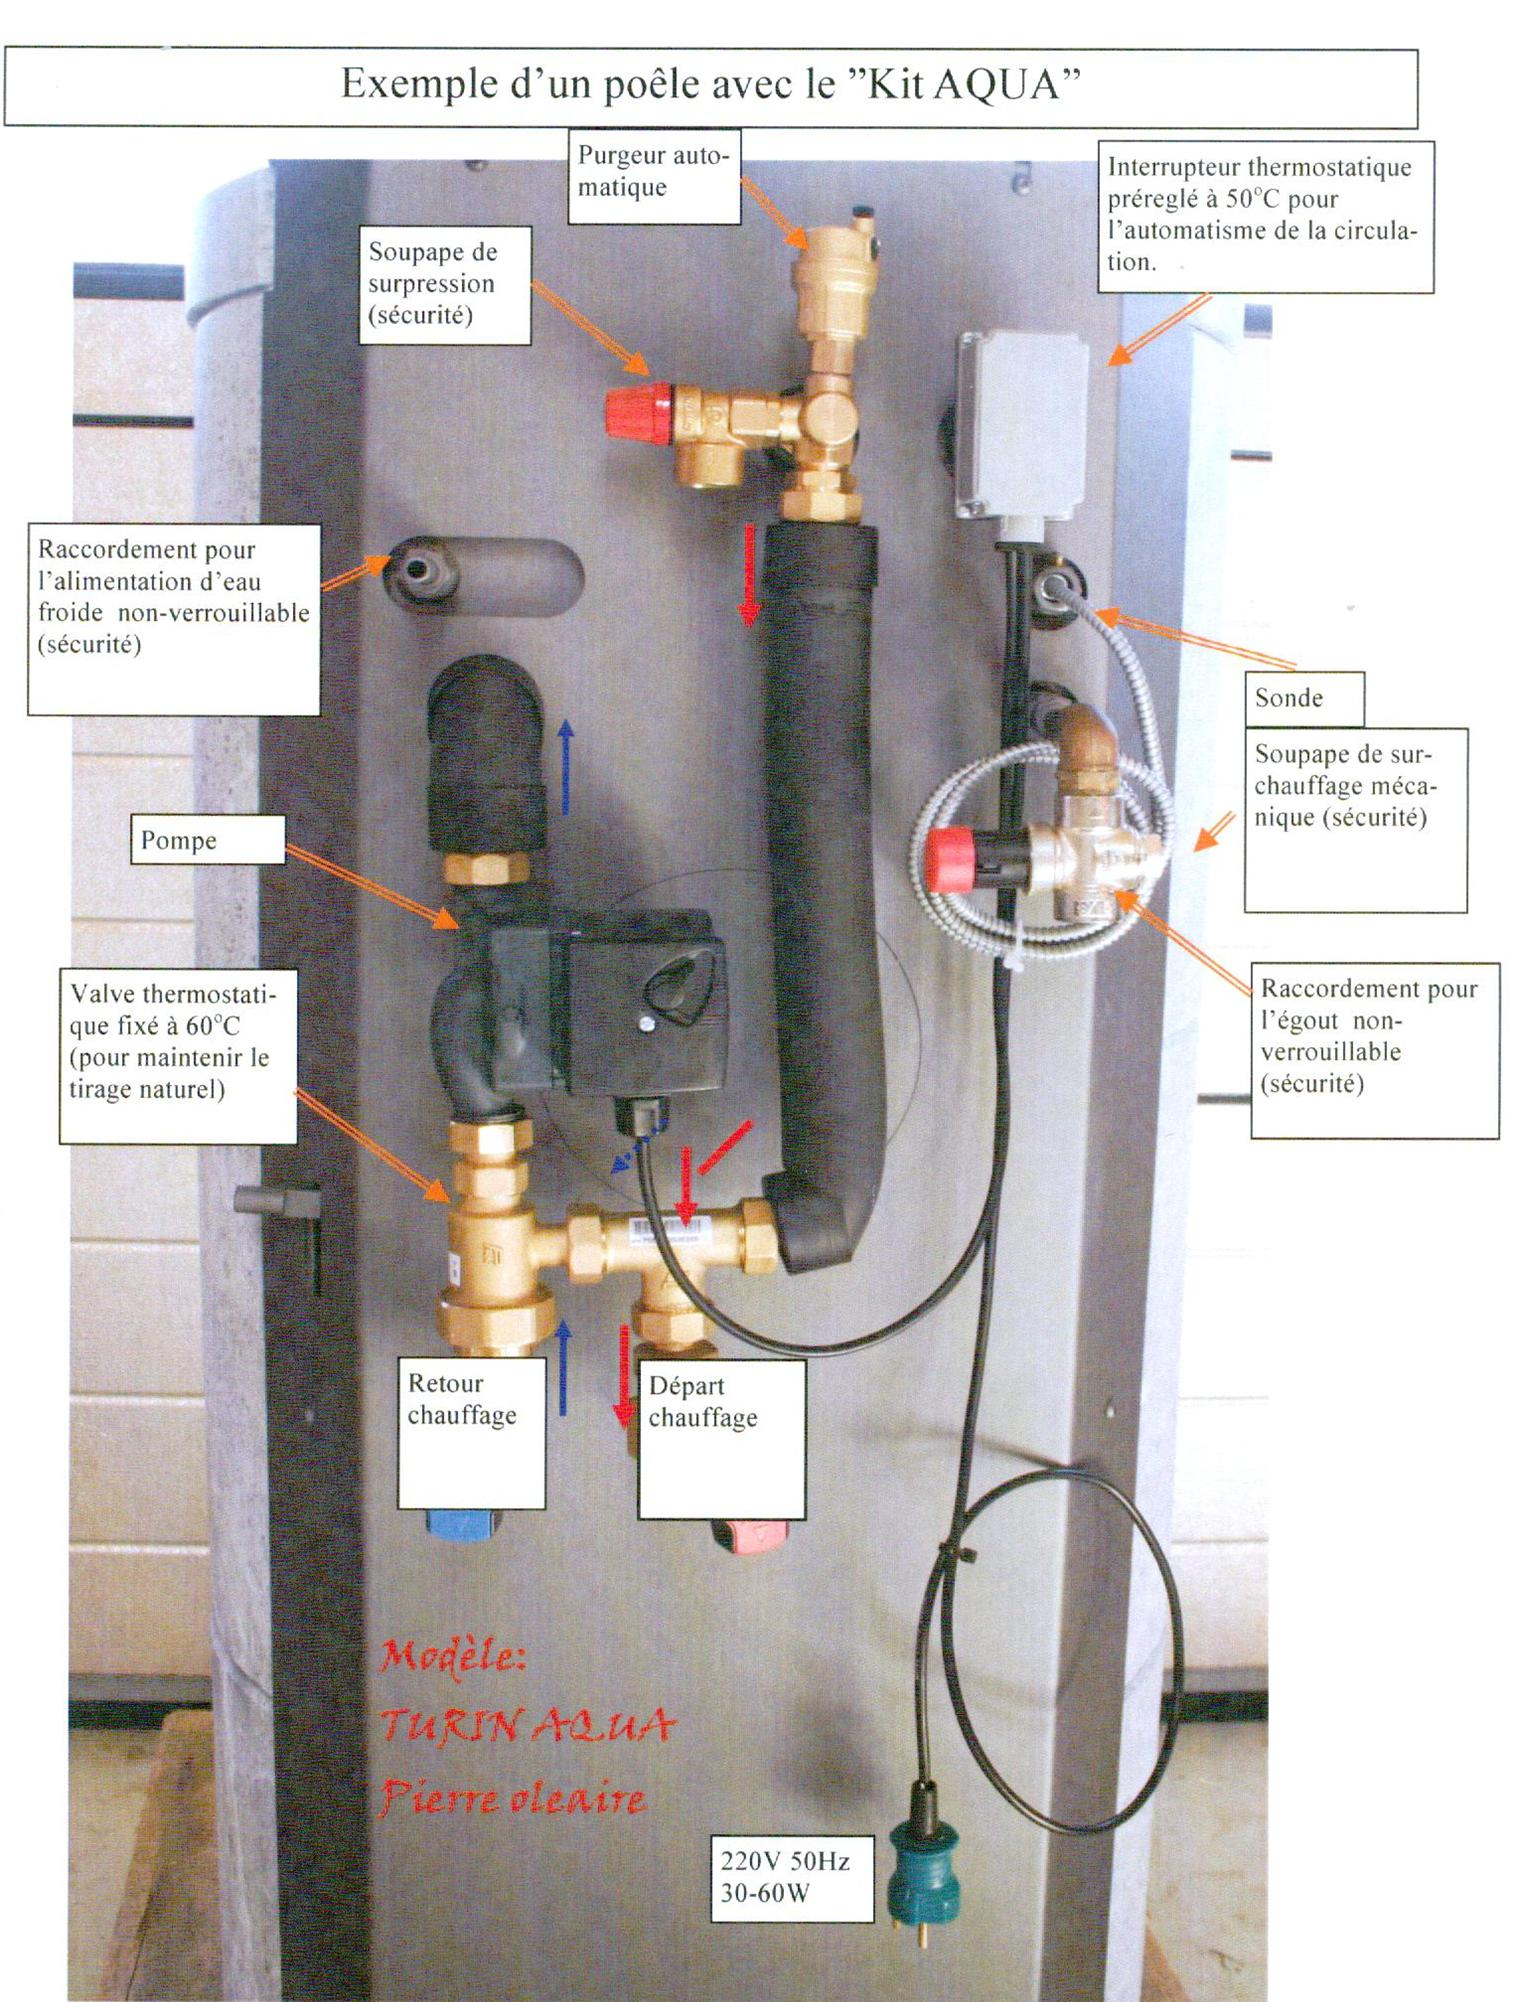 Aqua kit k 36 20 r f chauffage solutions chauffage for Chauffage central a granules